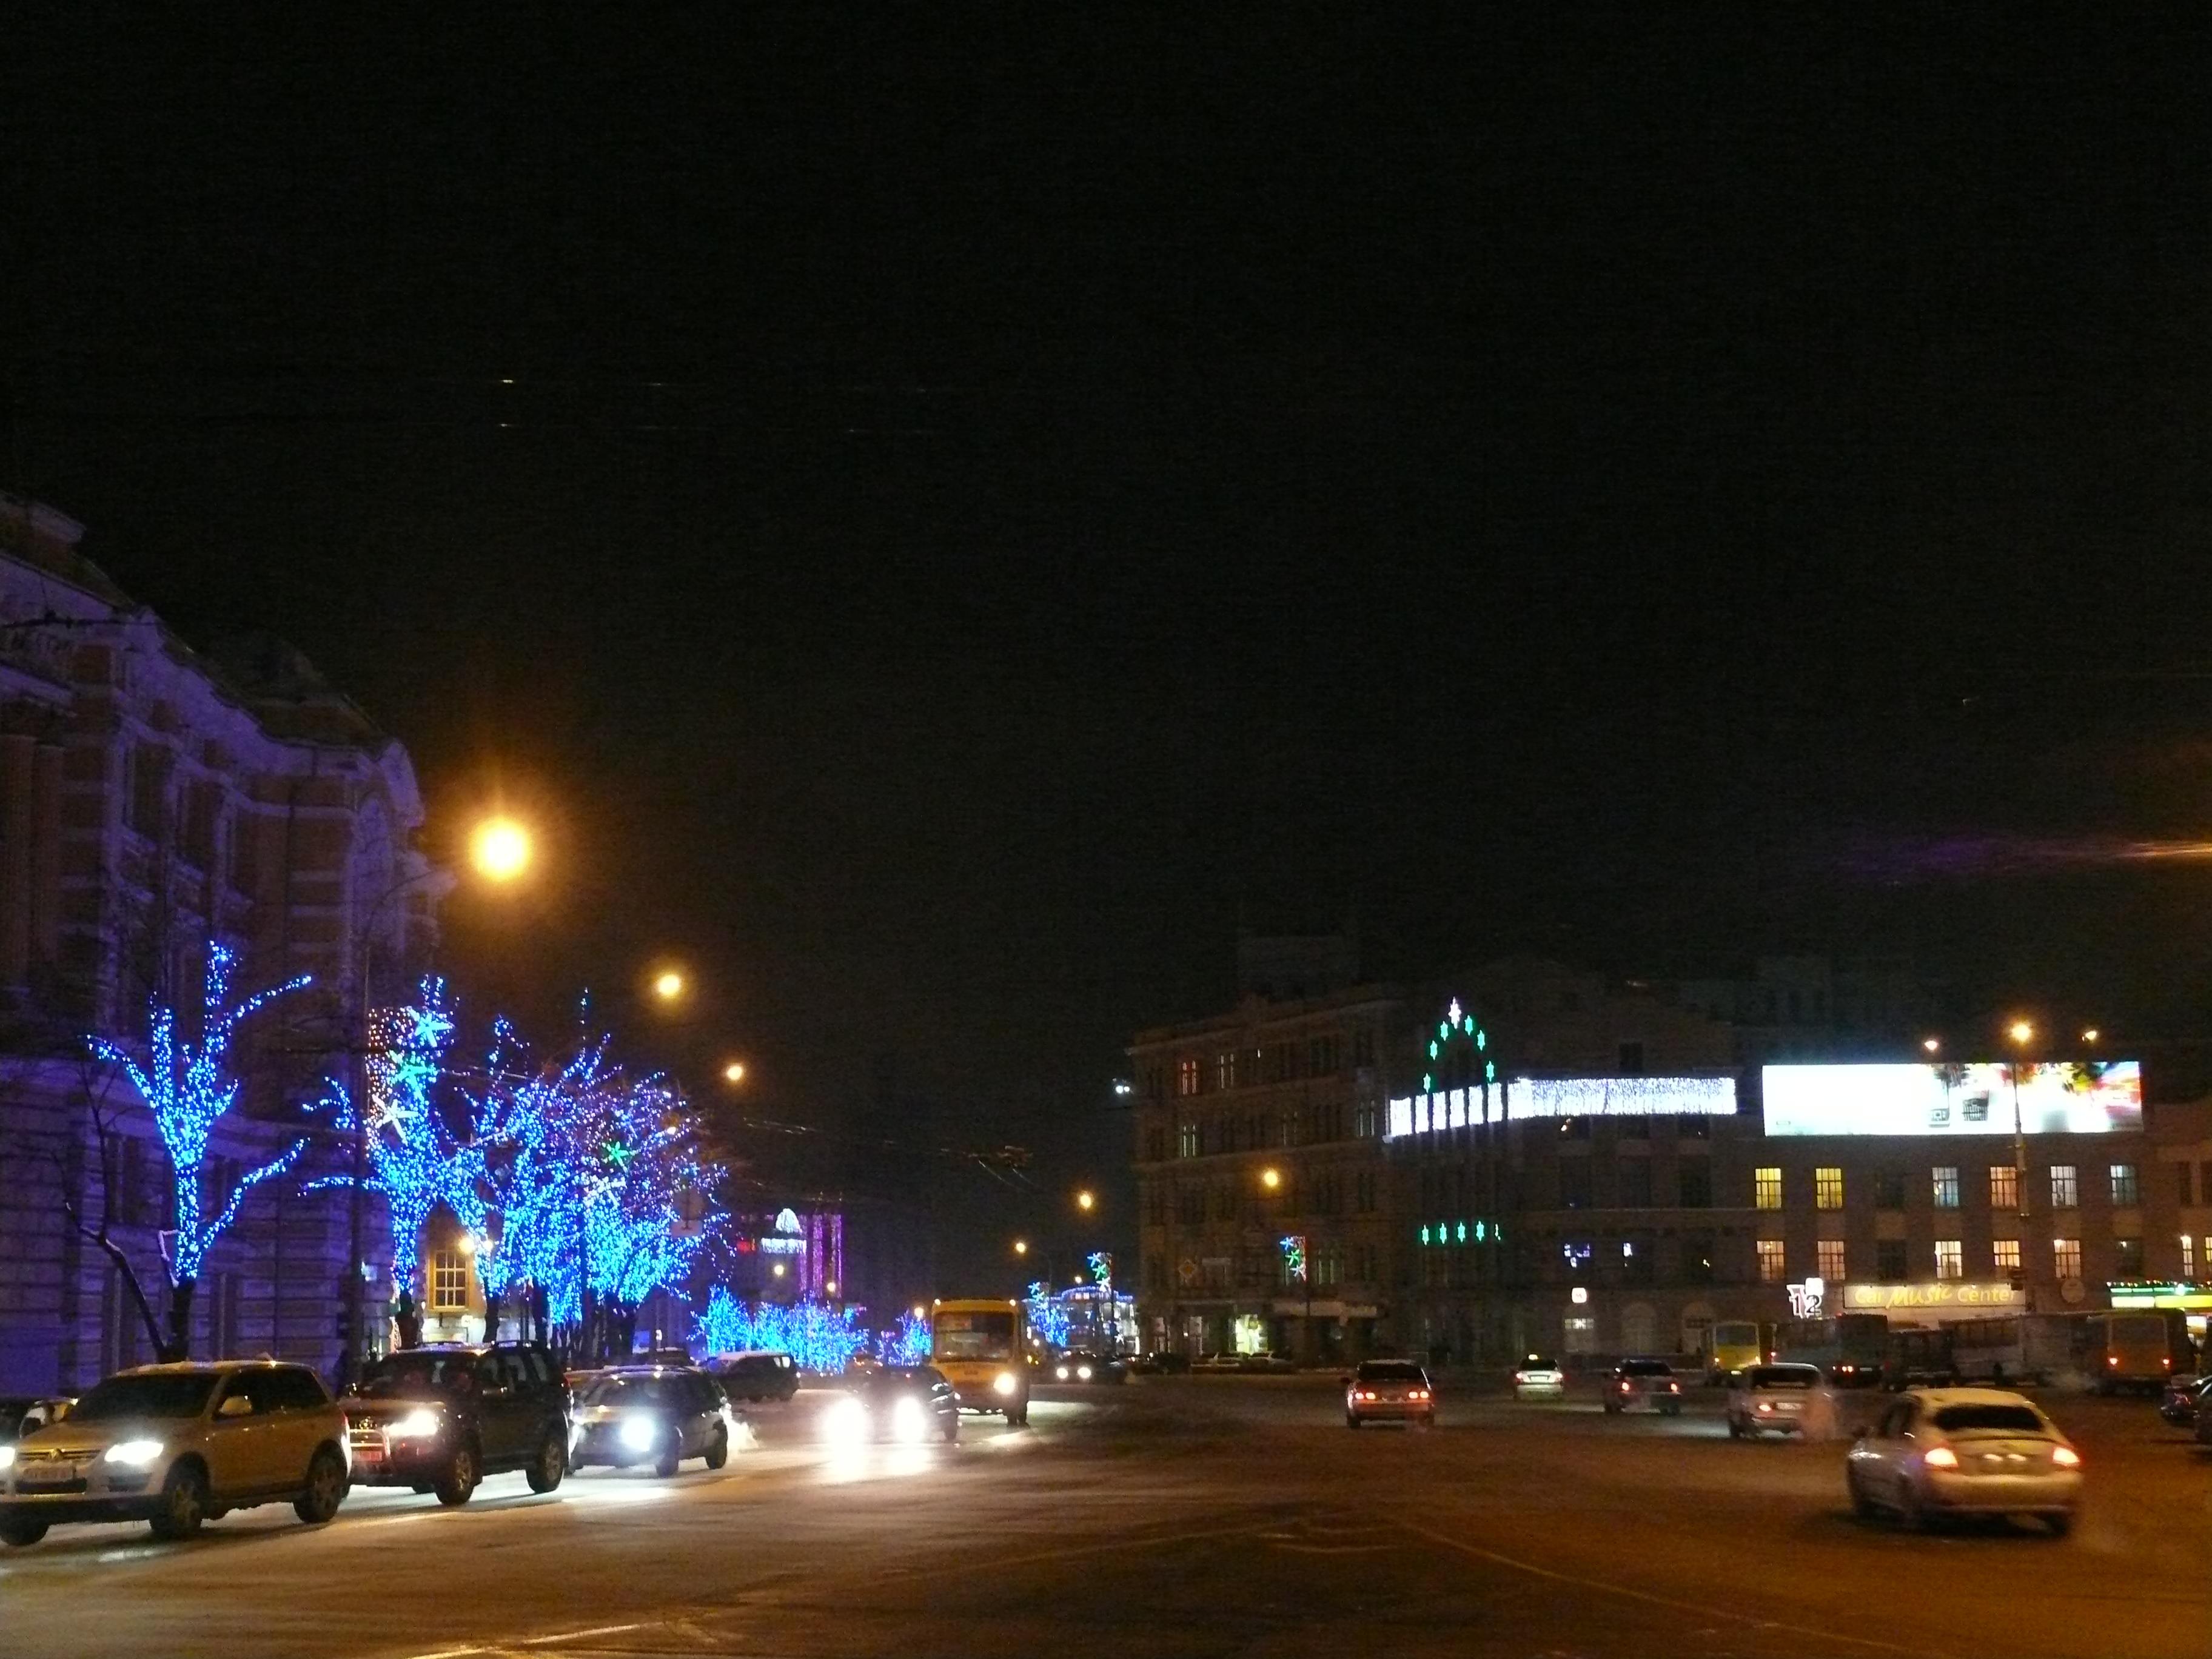 chernokozhie-v-chulkah